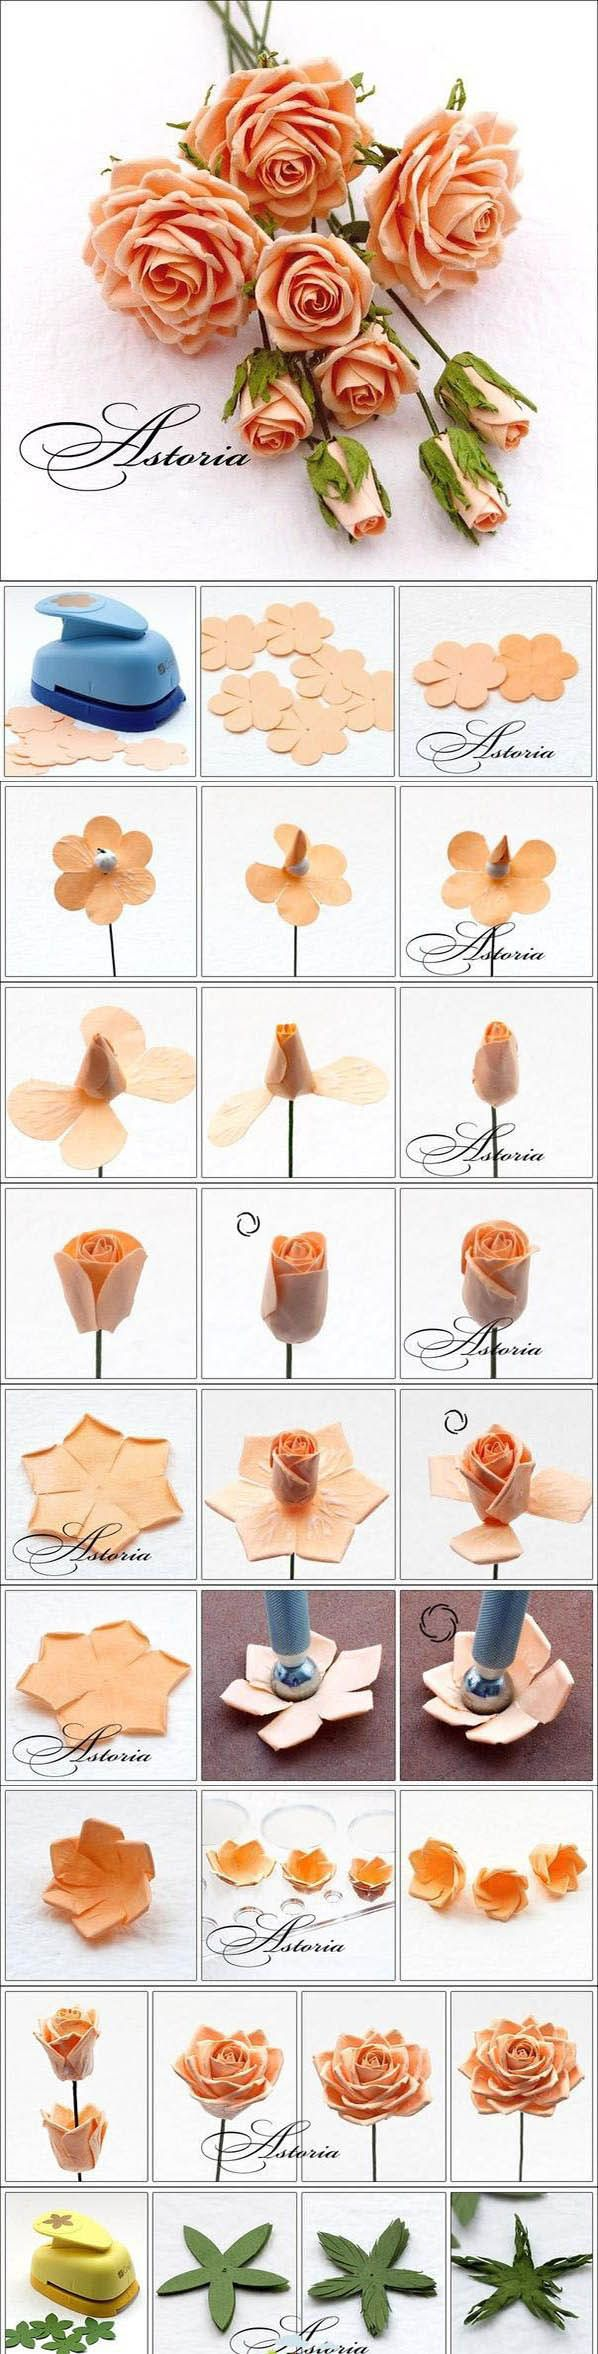 Fake flowers for crafts - Beautiful Pink Rose Diy Crafts Tutorials